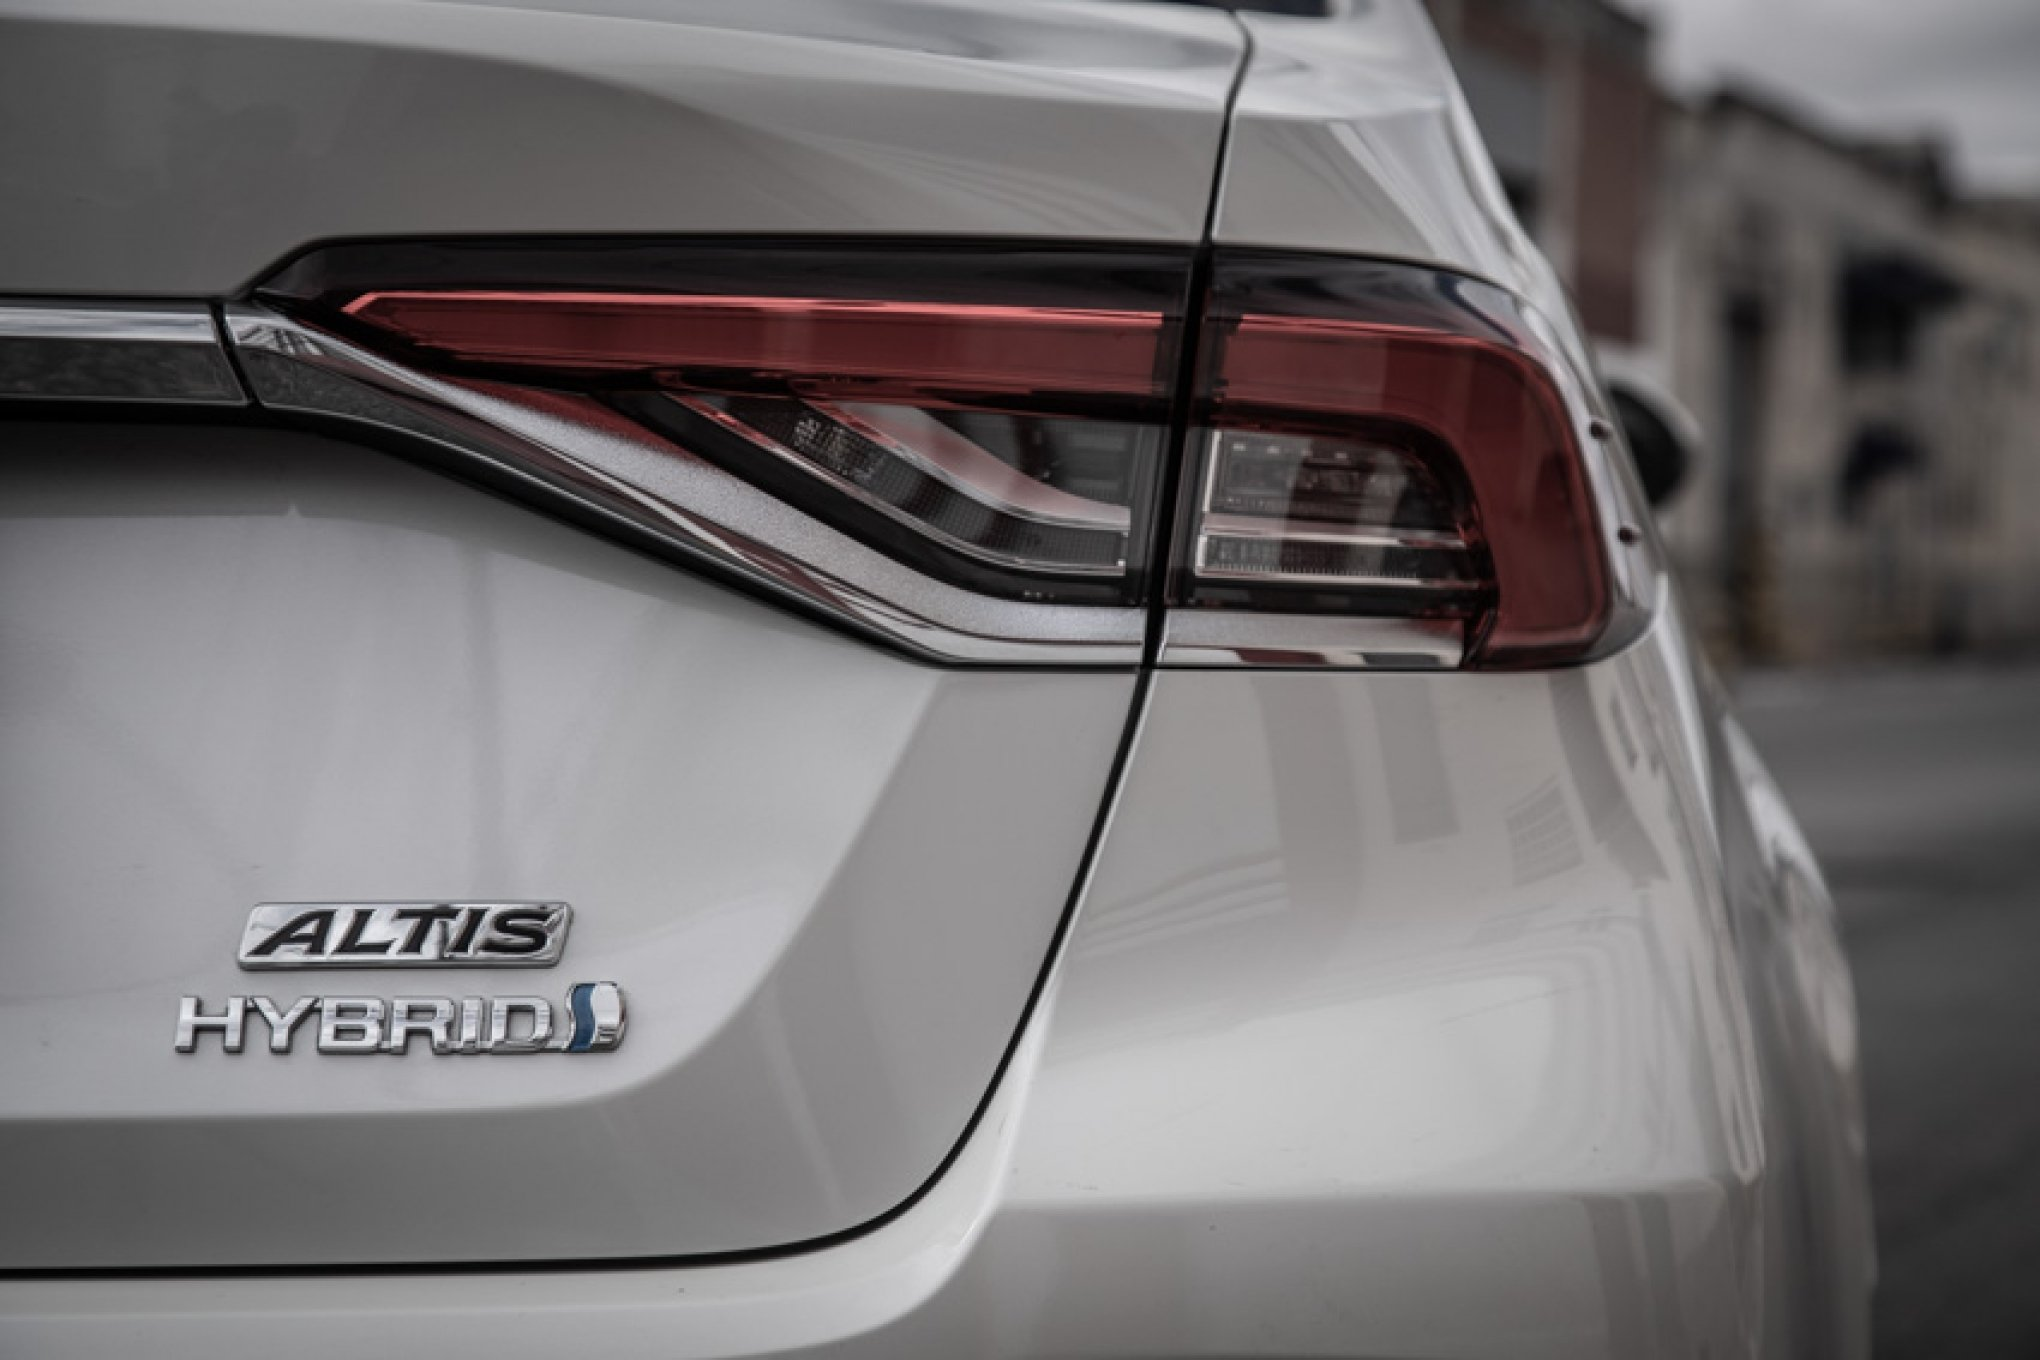 Novo Corolla 2020 ganha versão híbrida